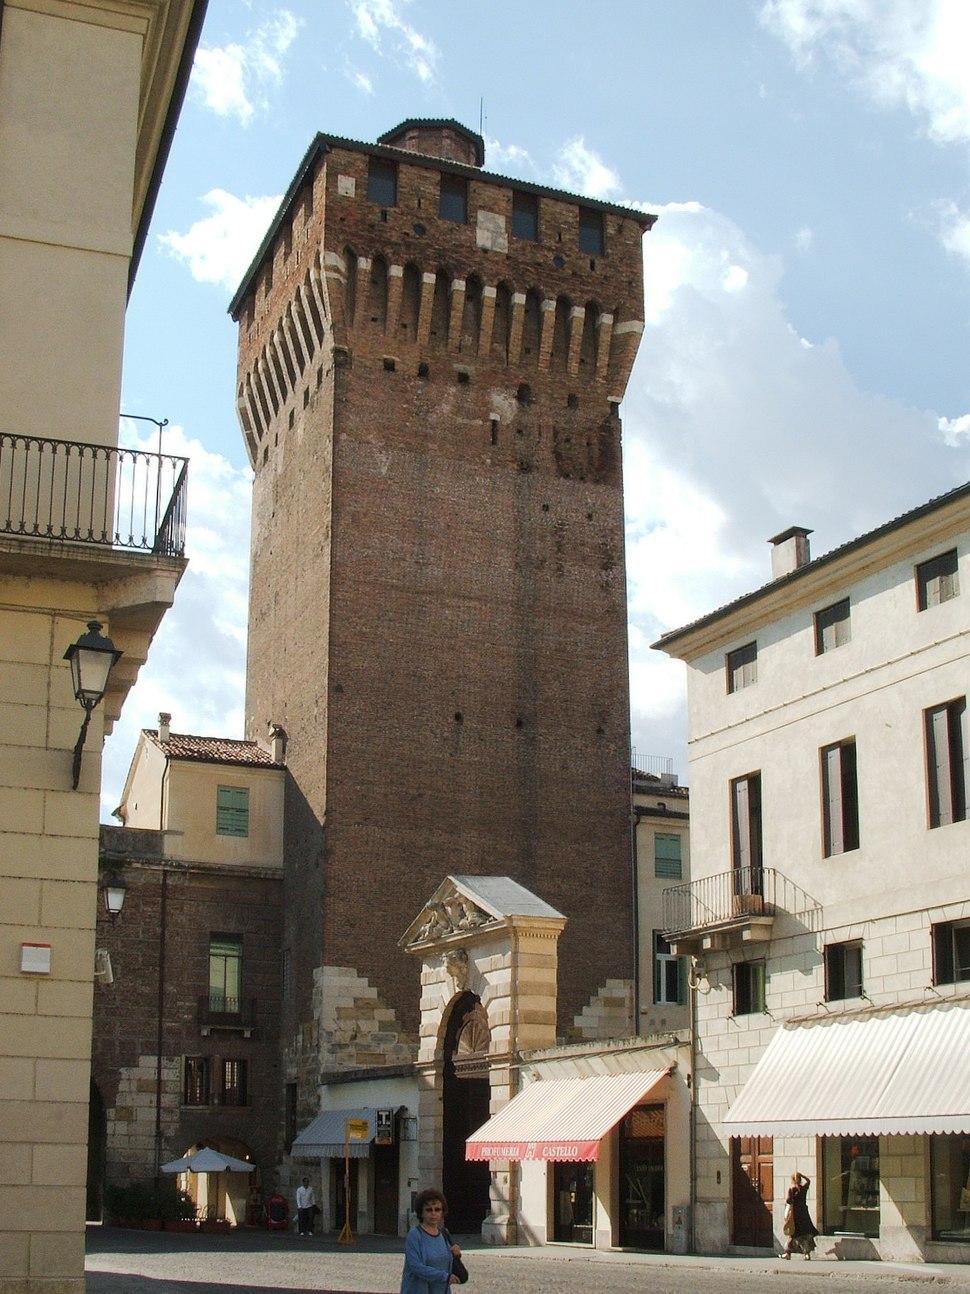 Vicenza - Torre di Piazza Castello